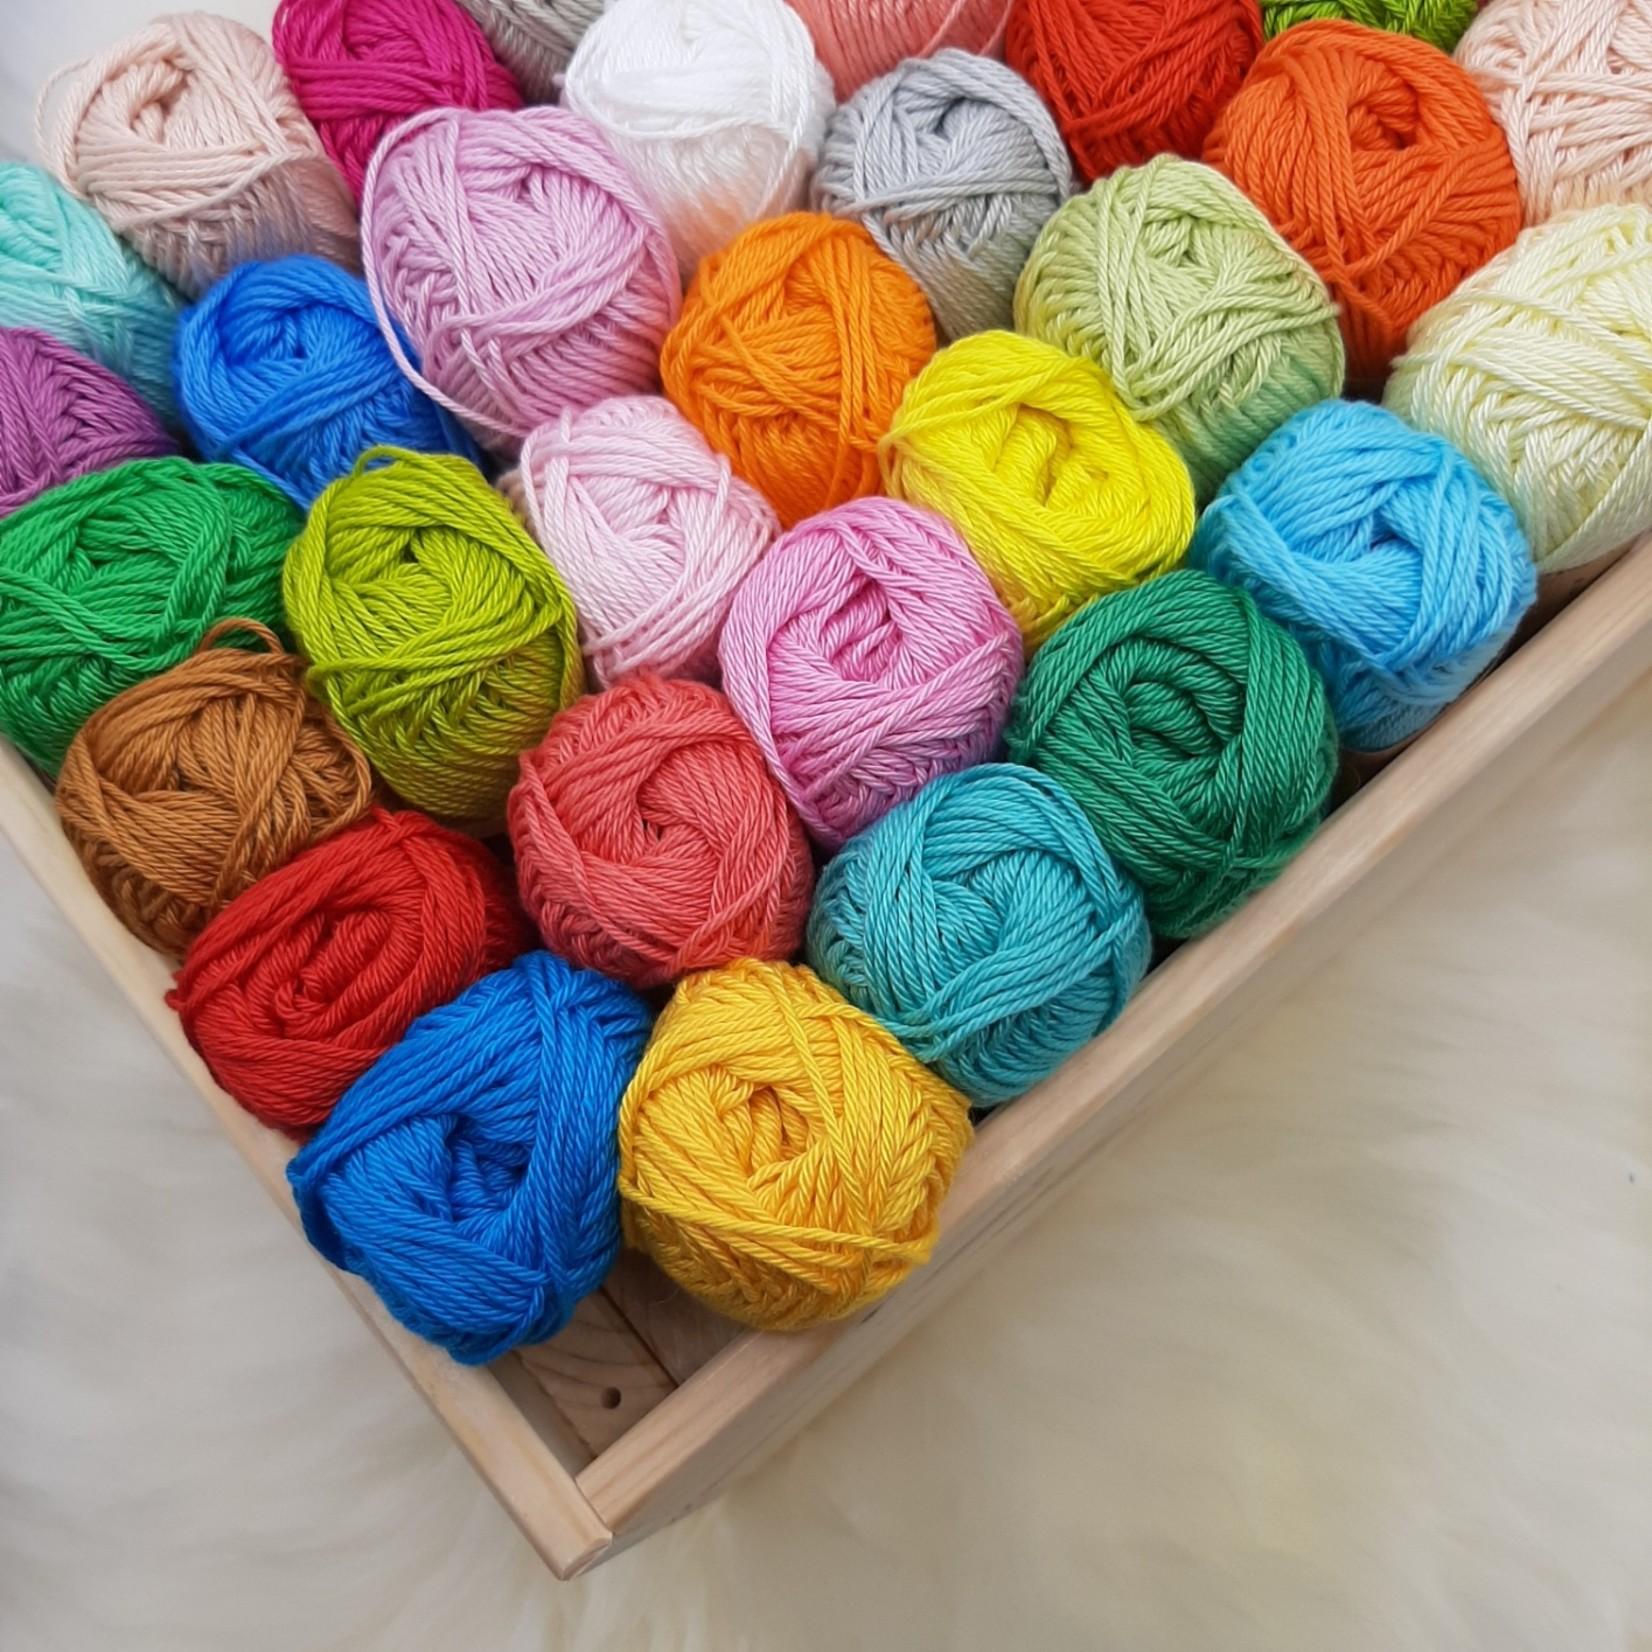 Scheepjes Scheepjes Catona Assortiment - 69 kleuren x 25 gr. - De Luxe